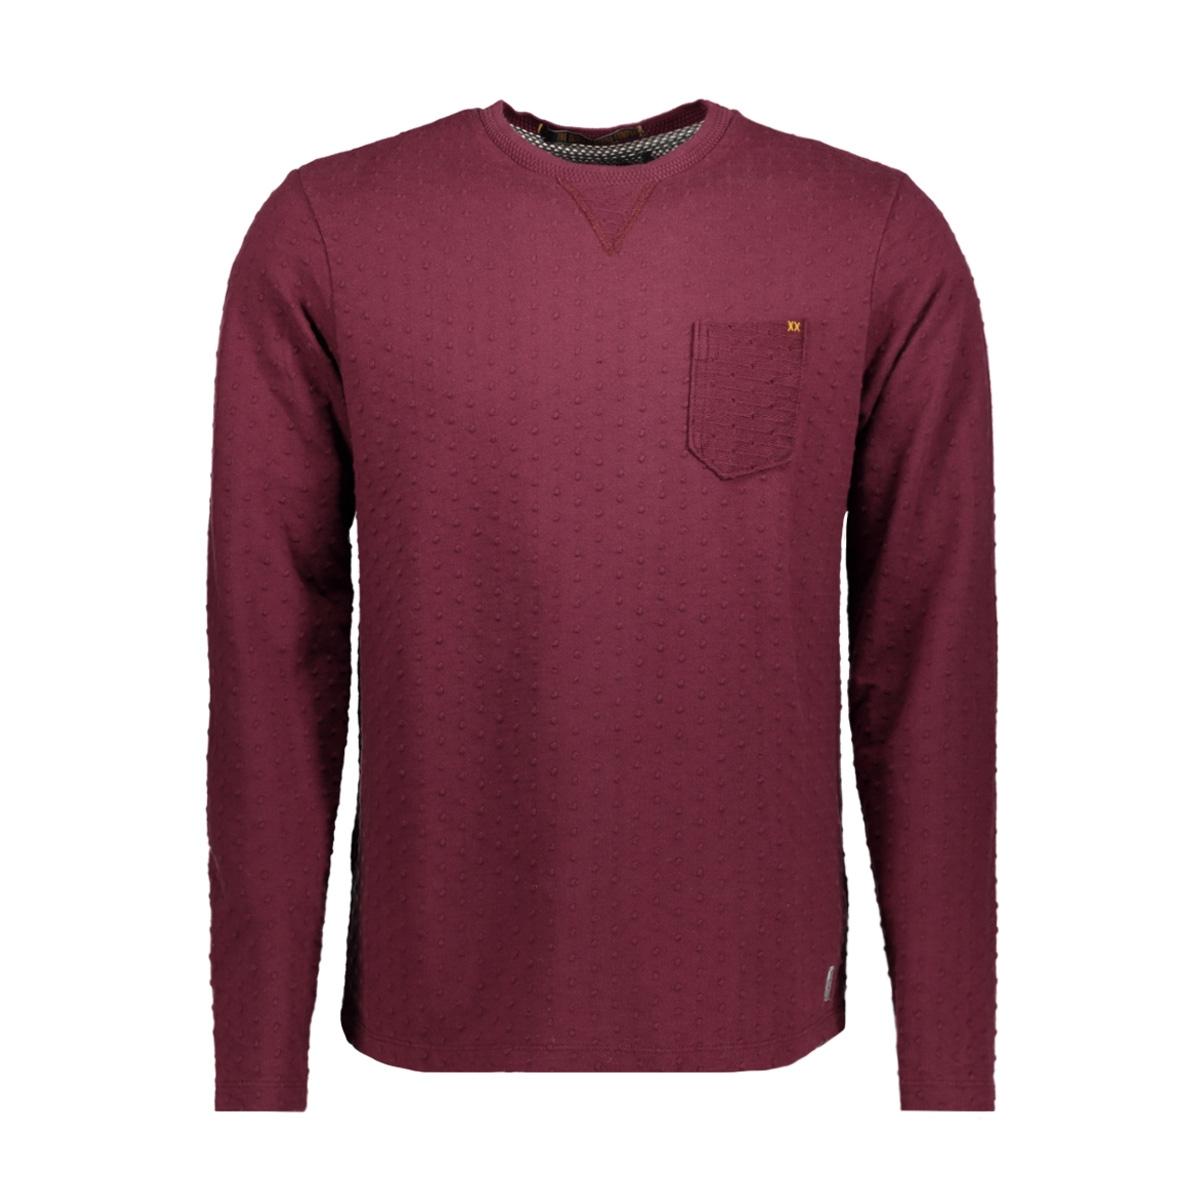 82110952 no-excess sweater 083 aubergine